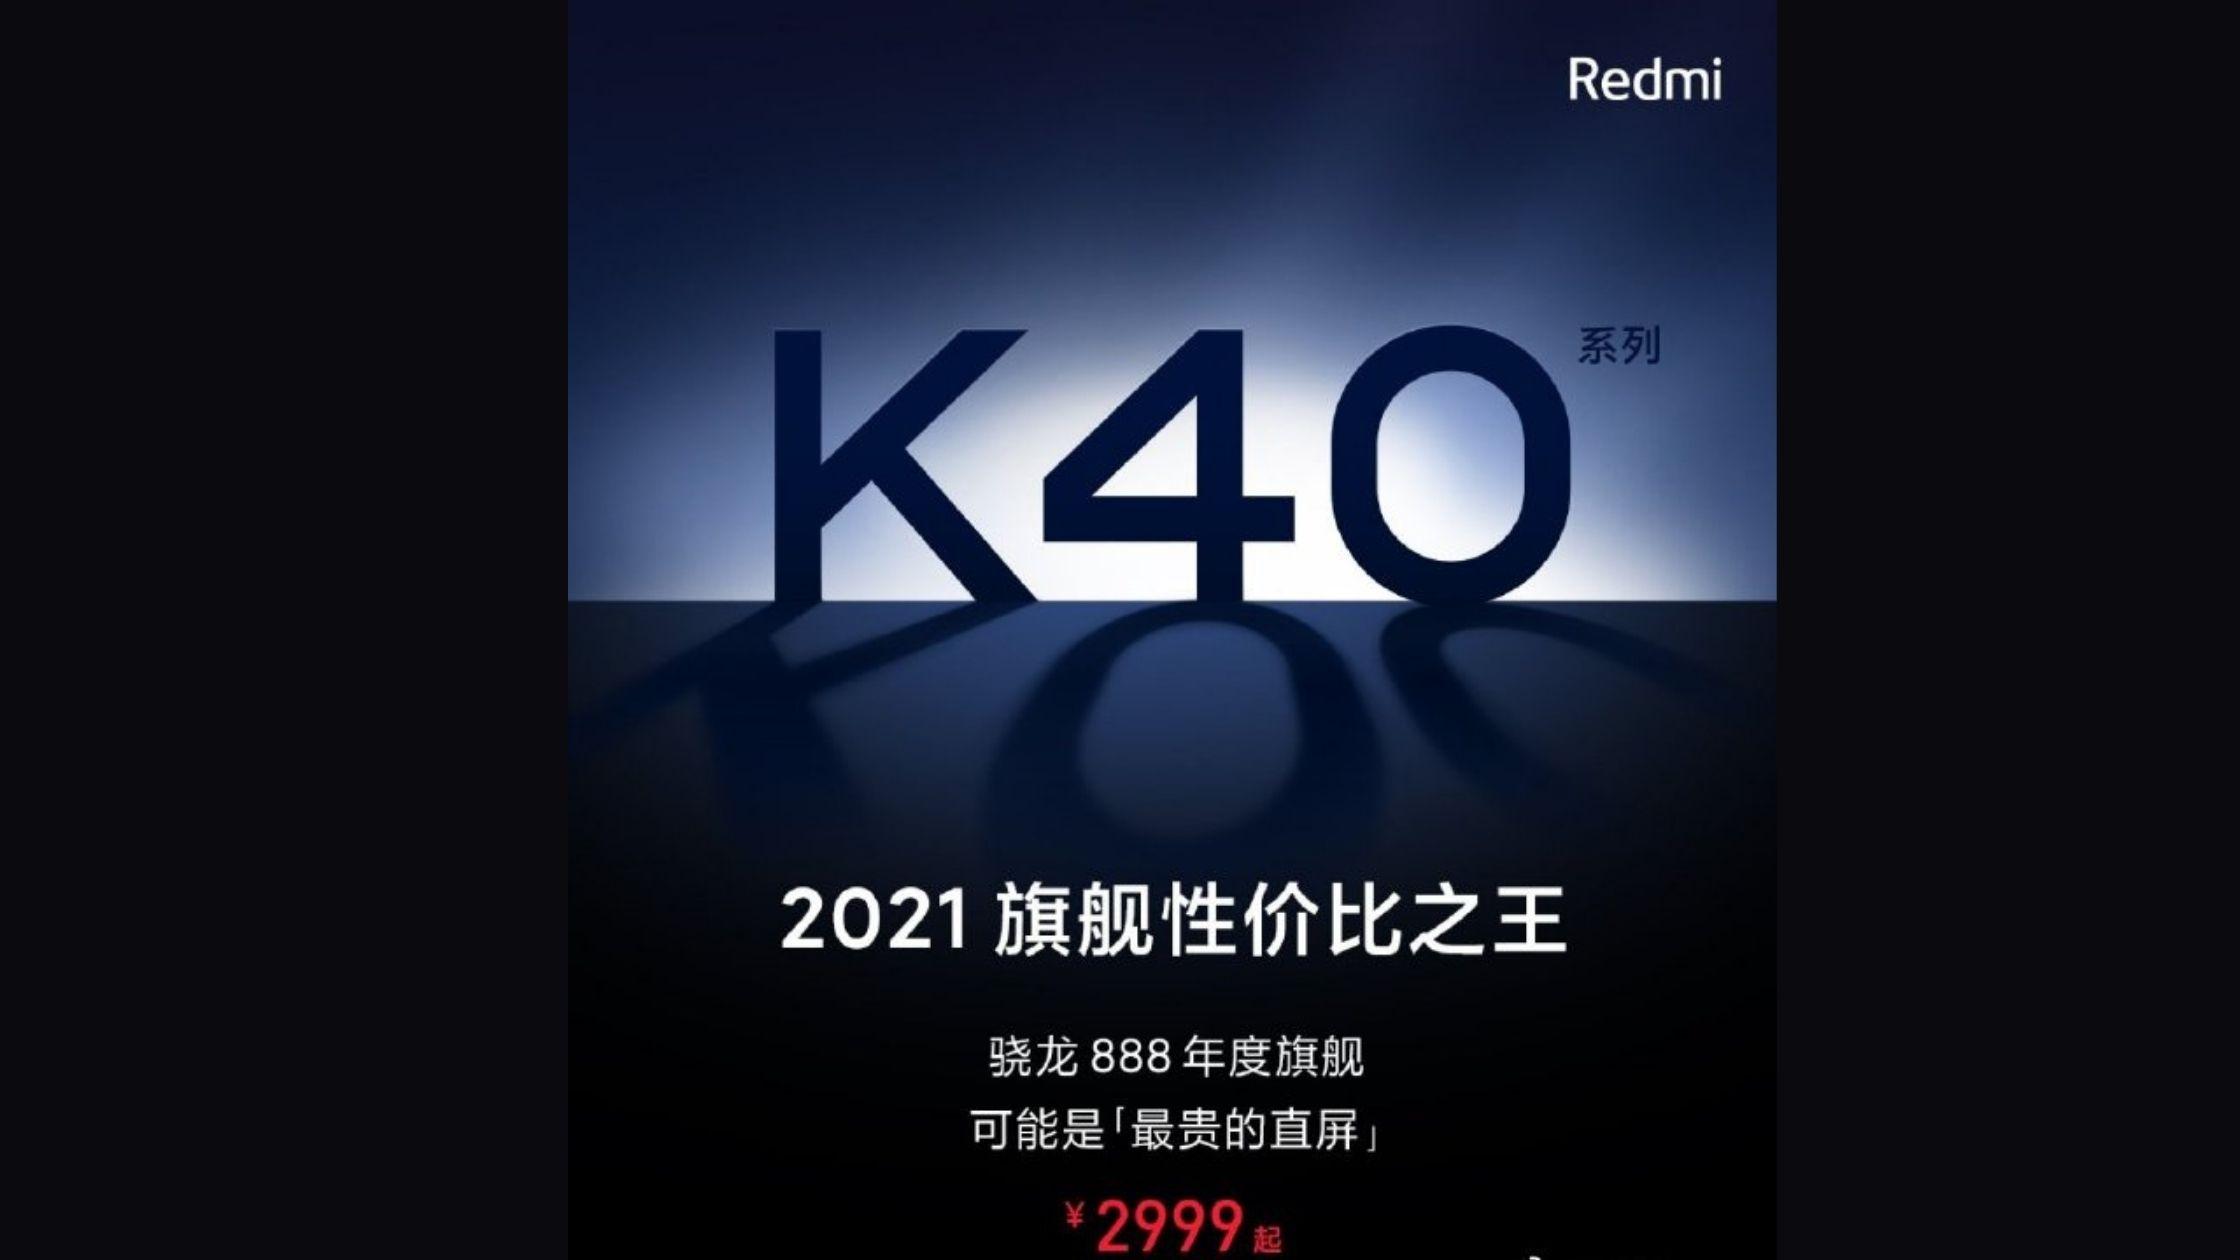 Redmi K40